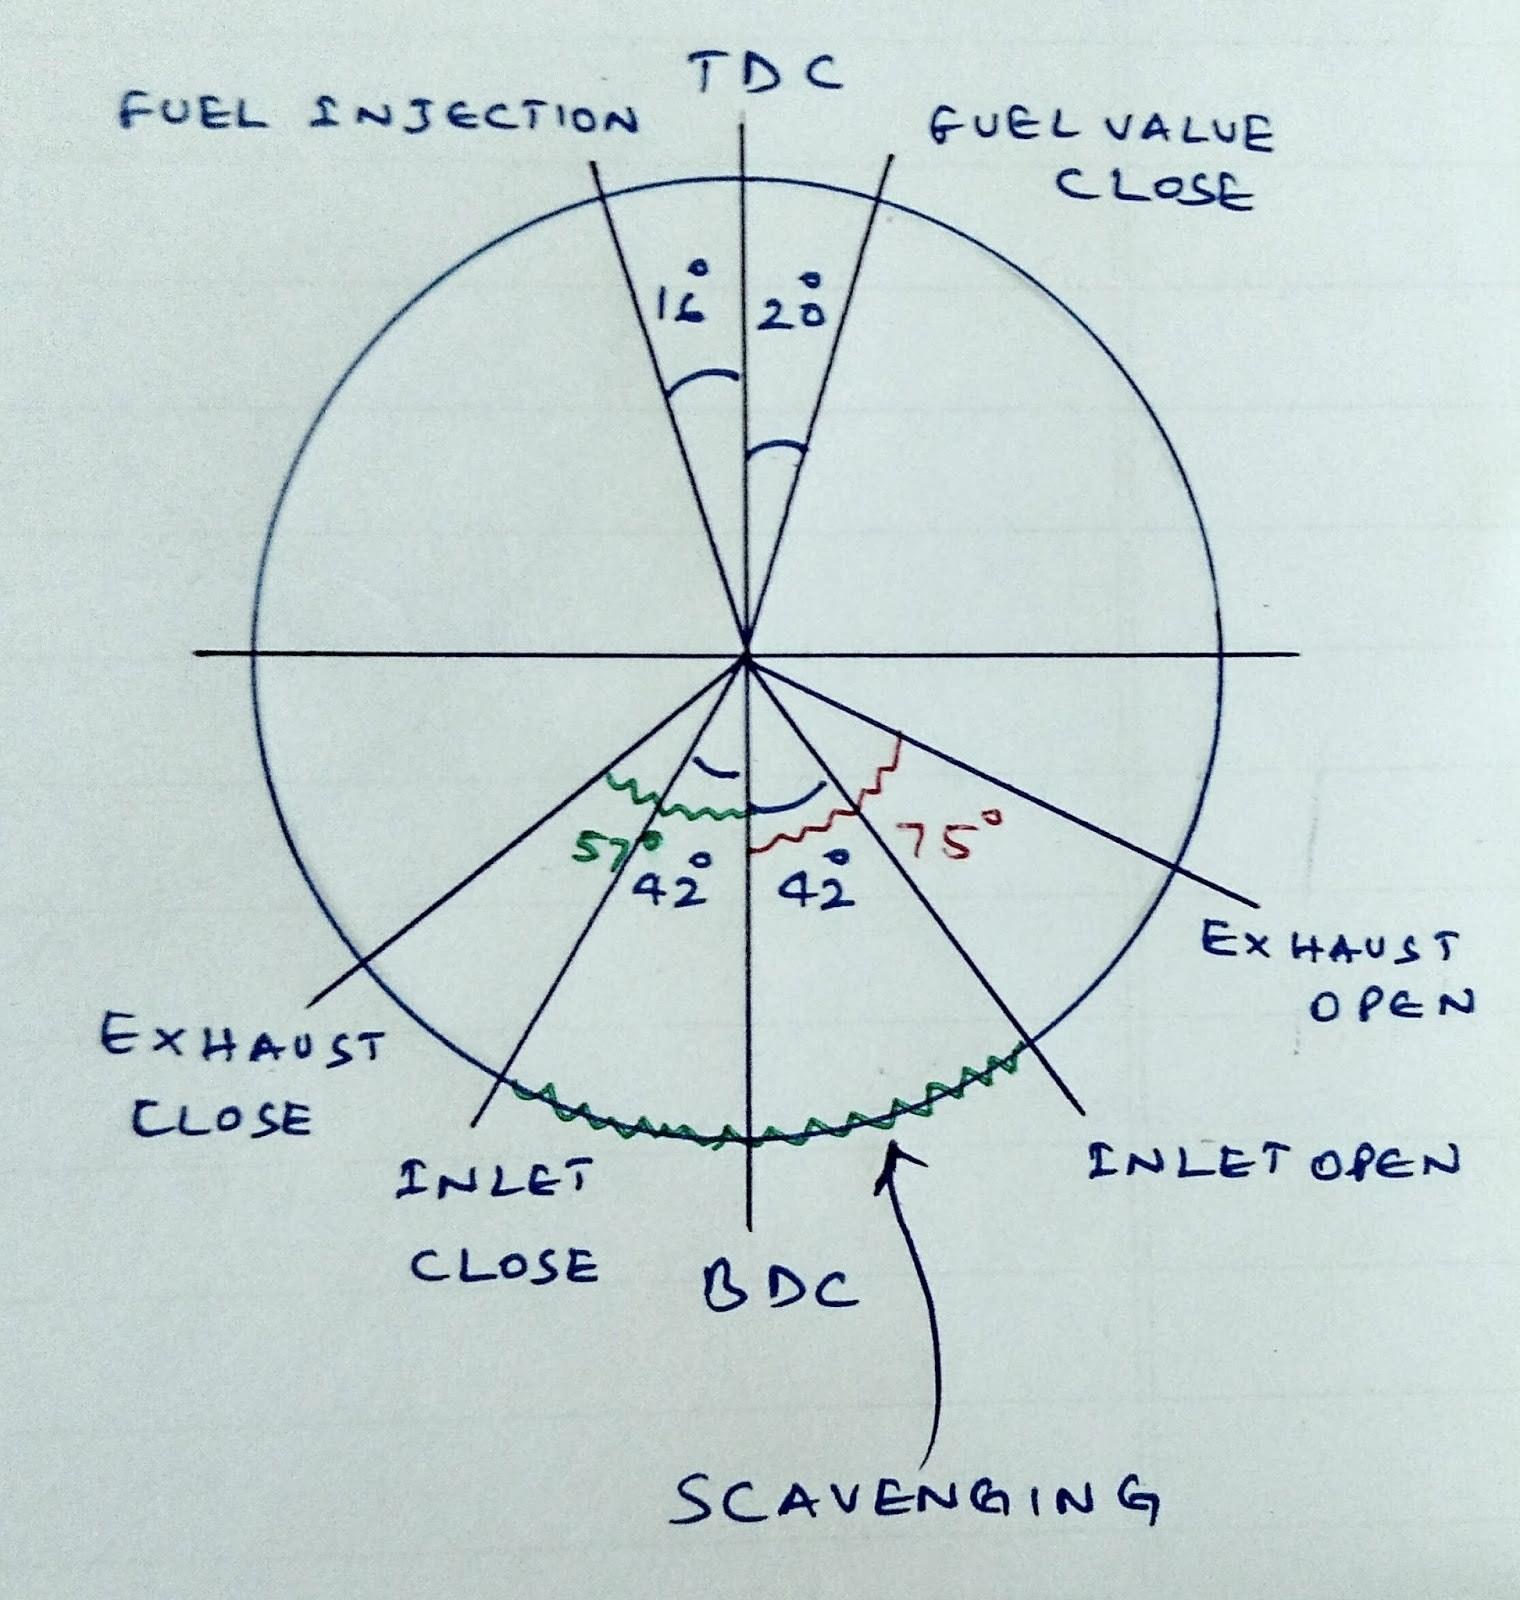 4 stroke petrol engine diagram toyota audio wiring valve timing of four